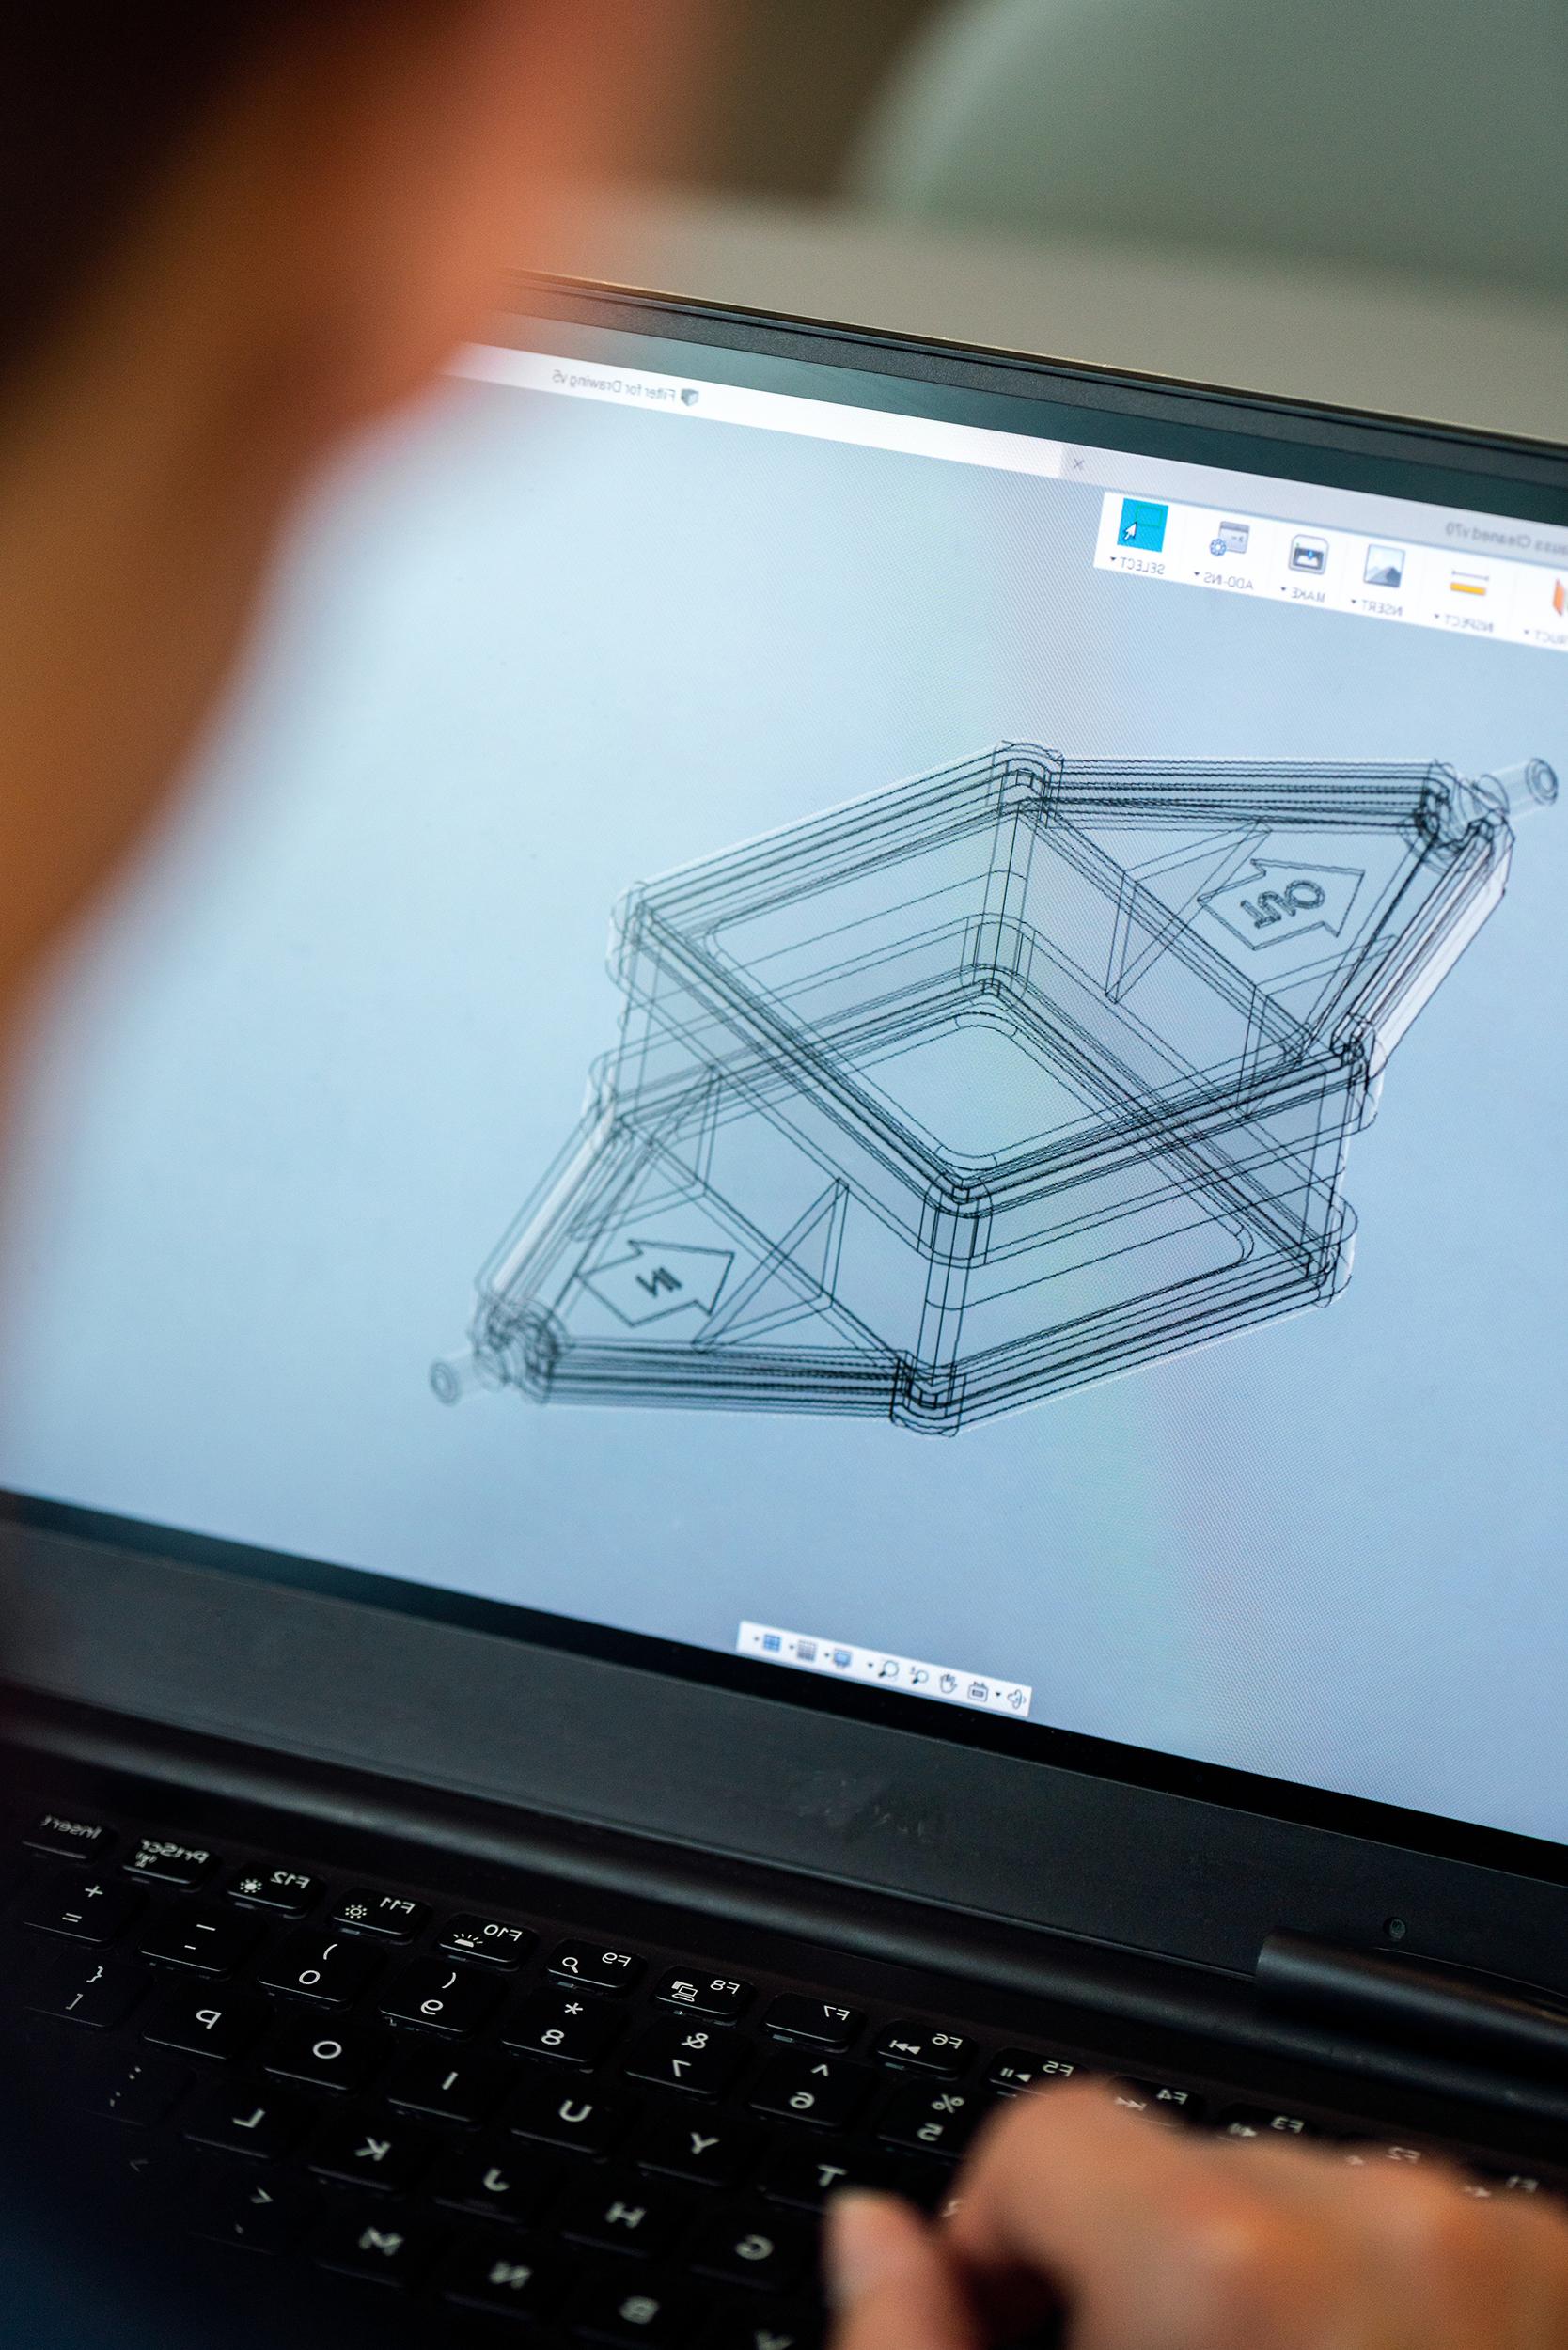 CAD Design on a computer screen